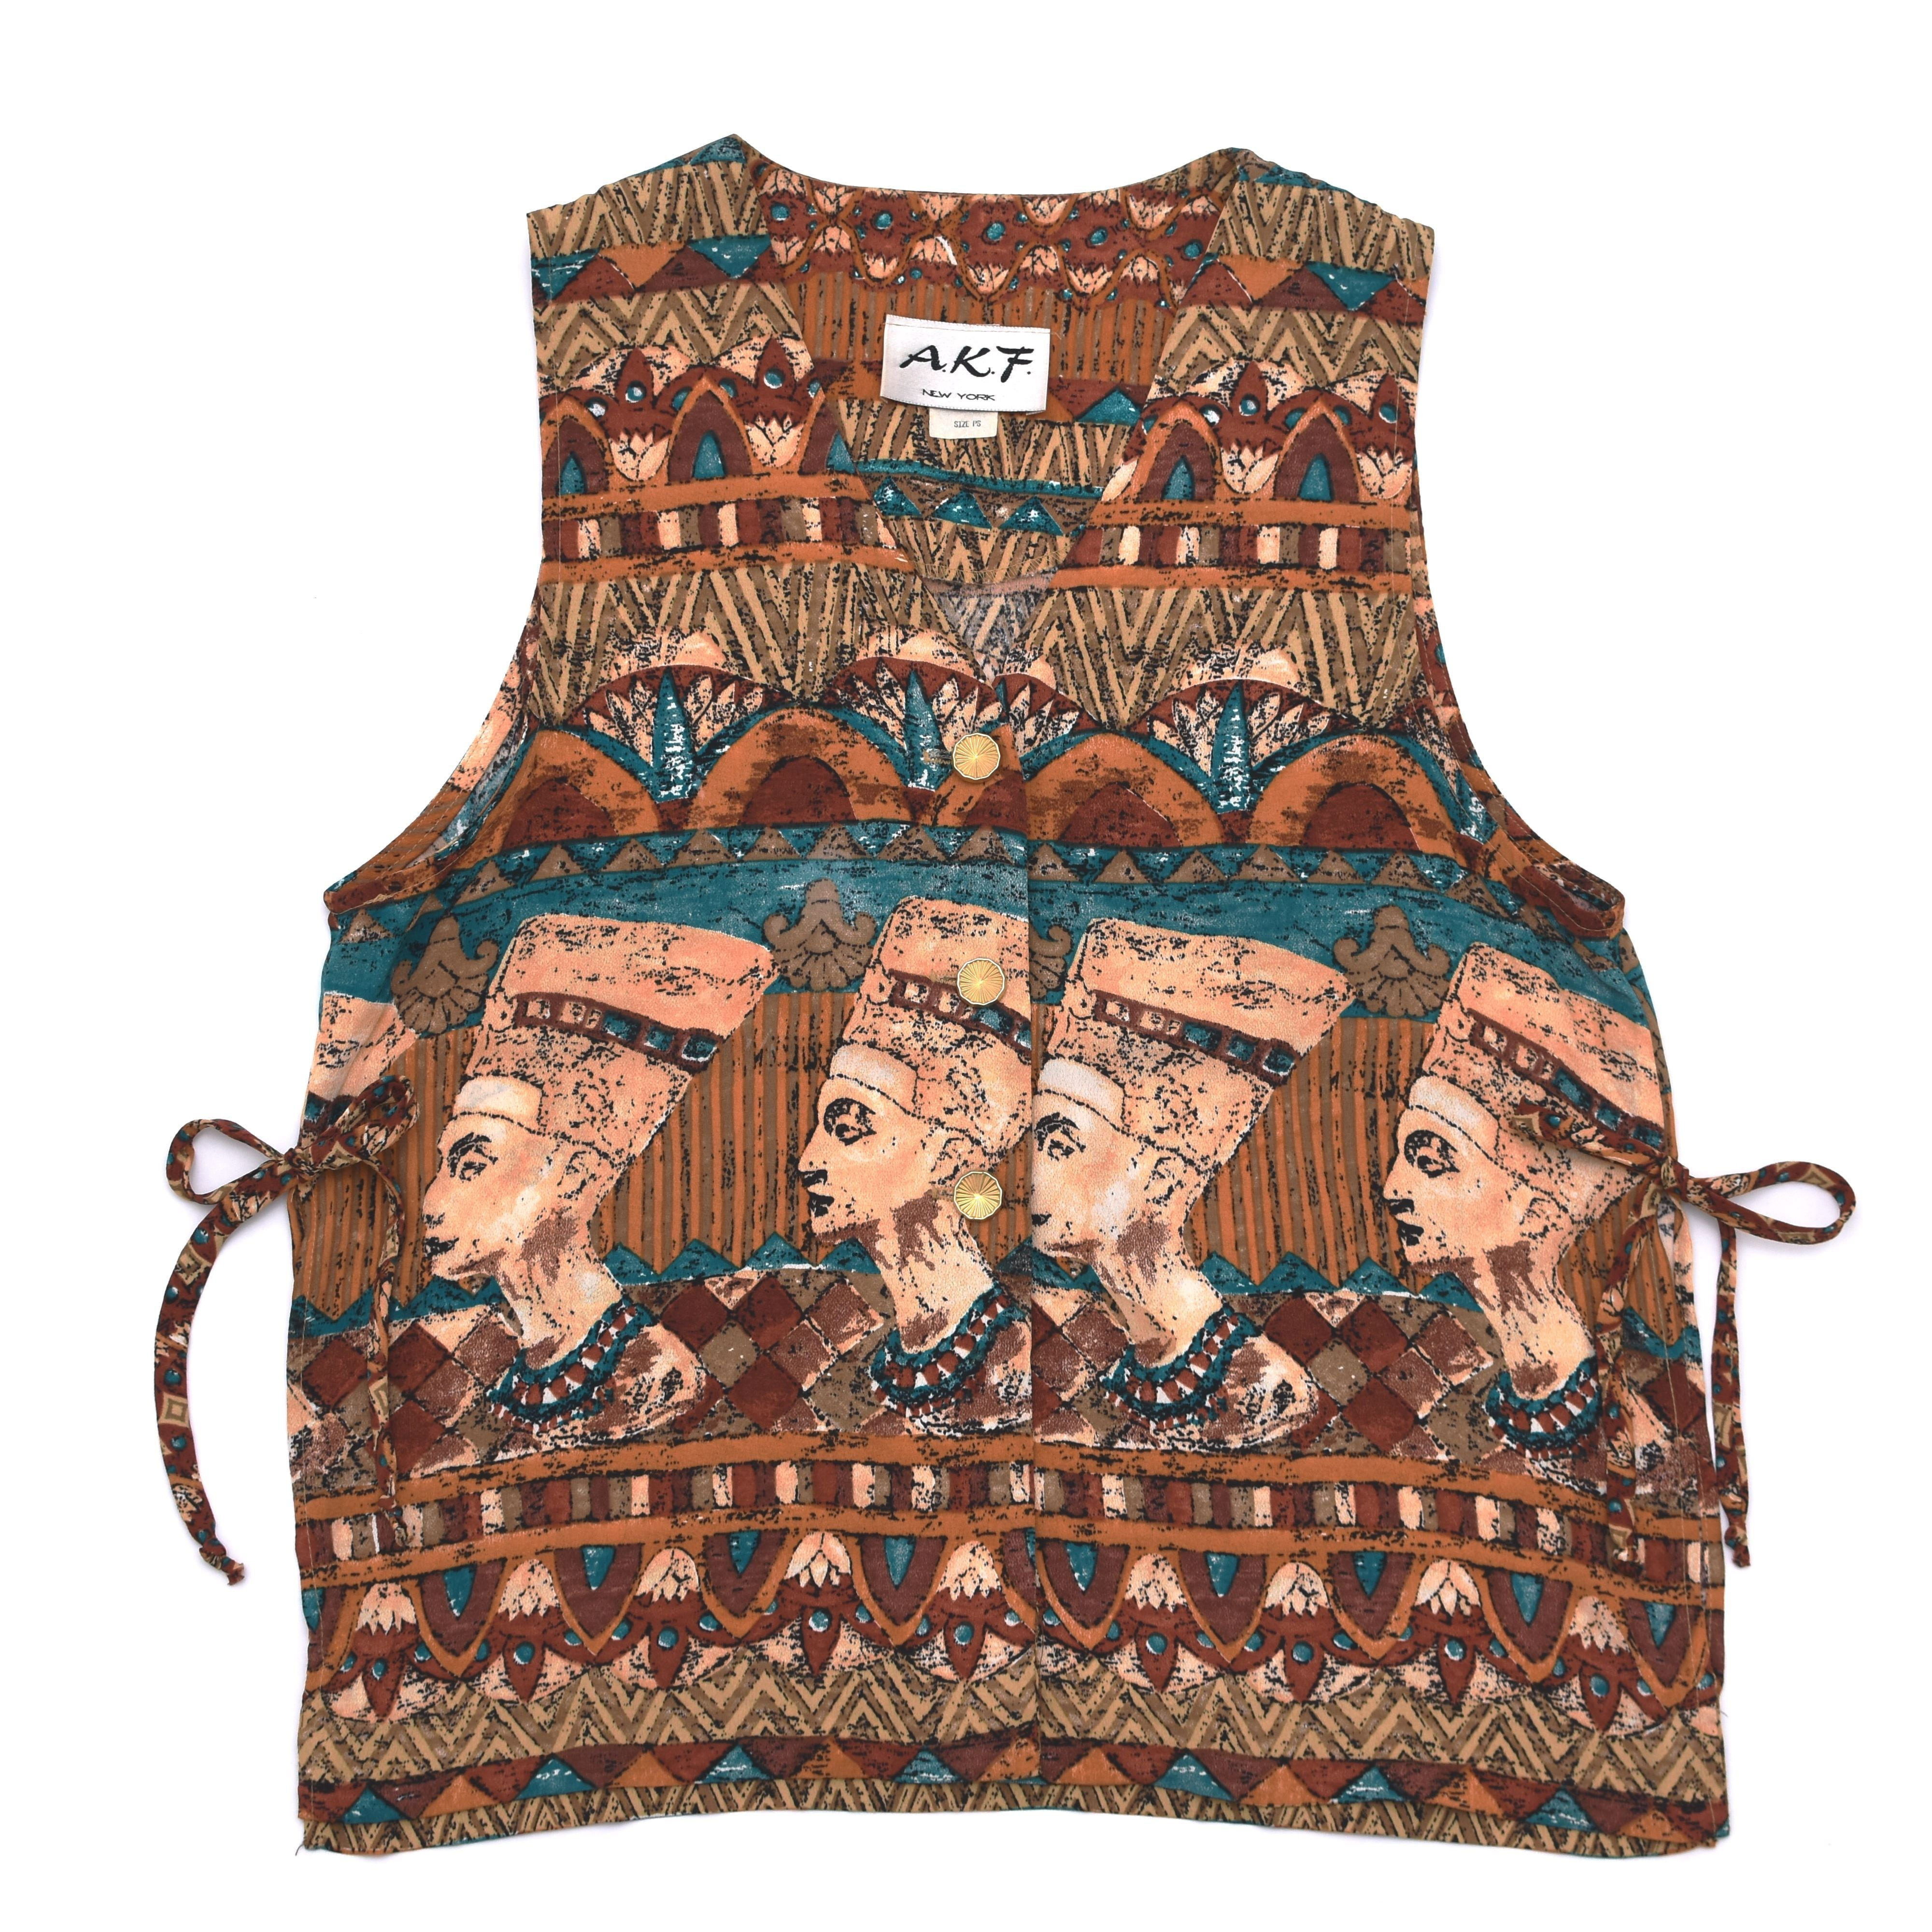 VTG Egyptian pattern rayon vest US Made